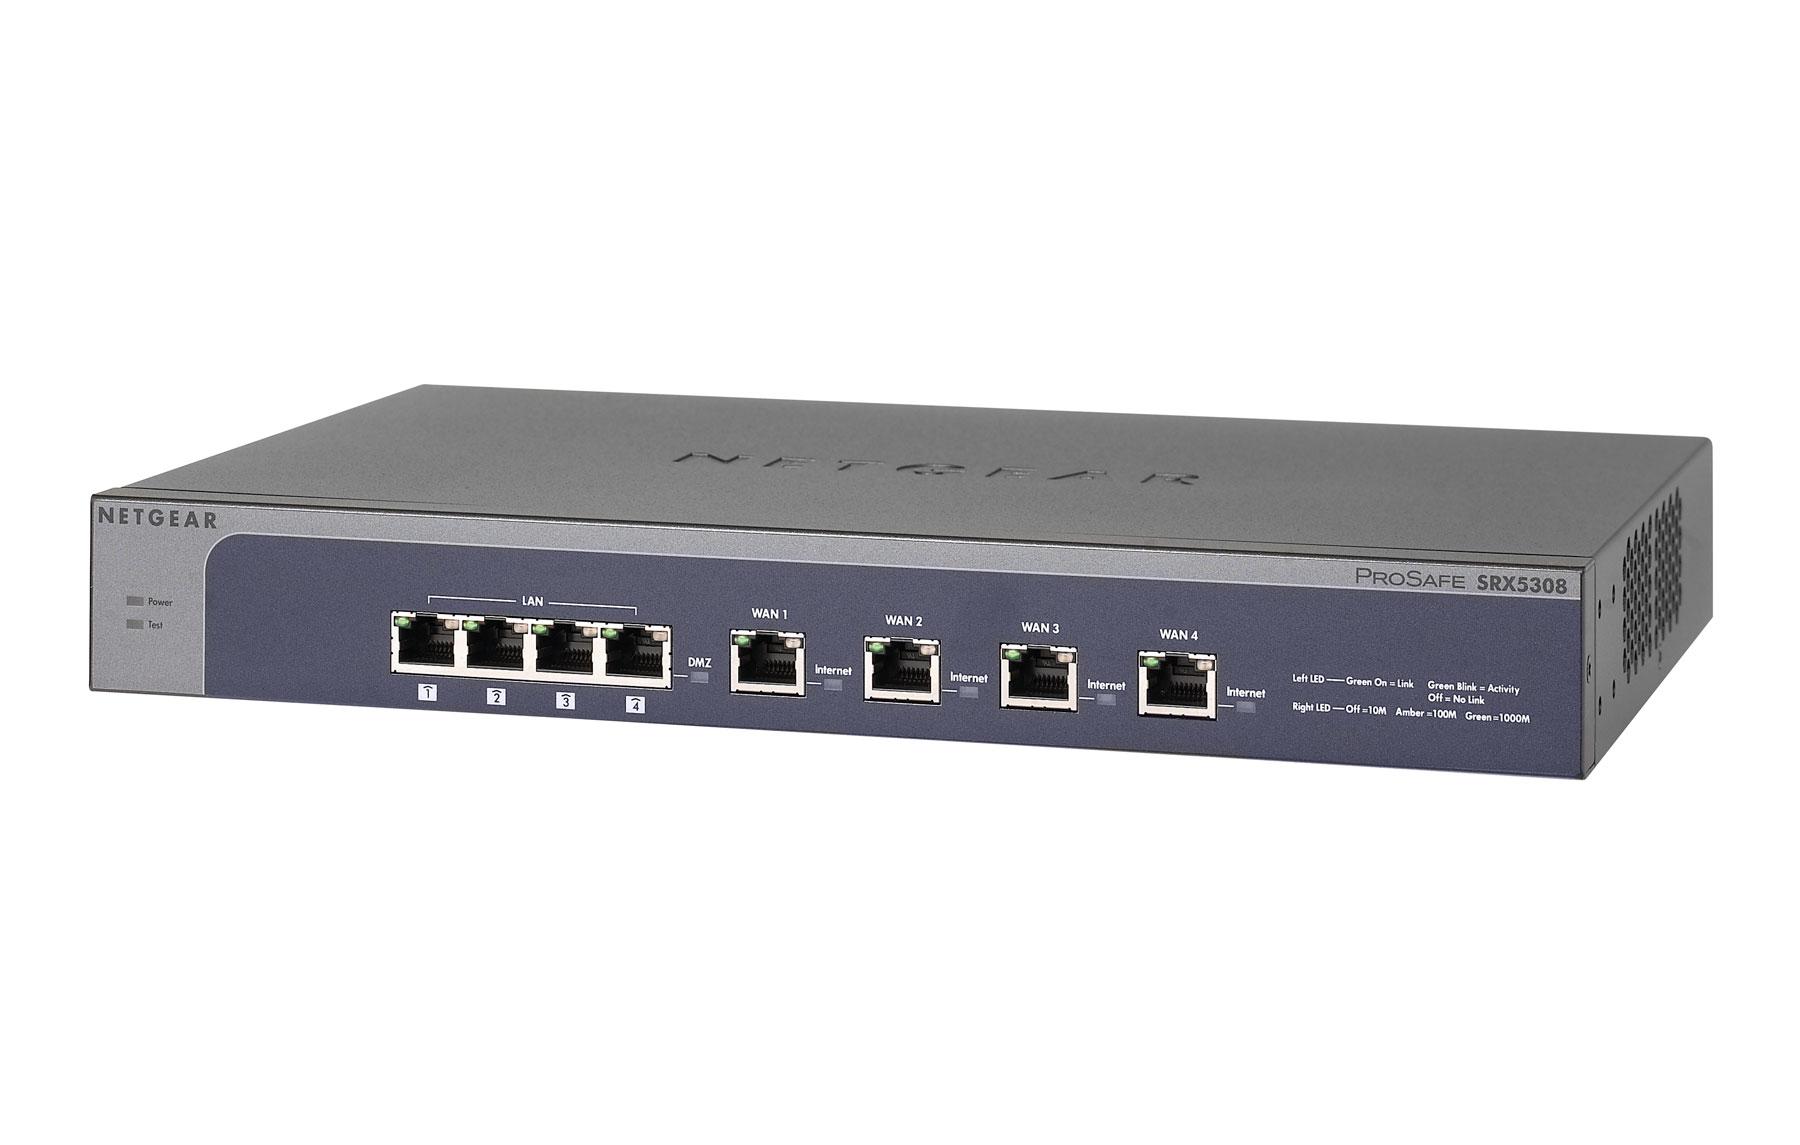 Netgear SRX5308 firewall